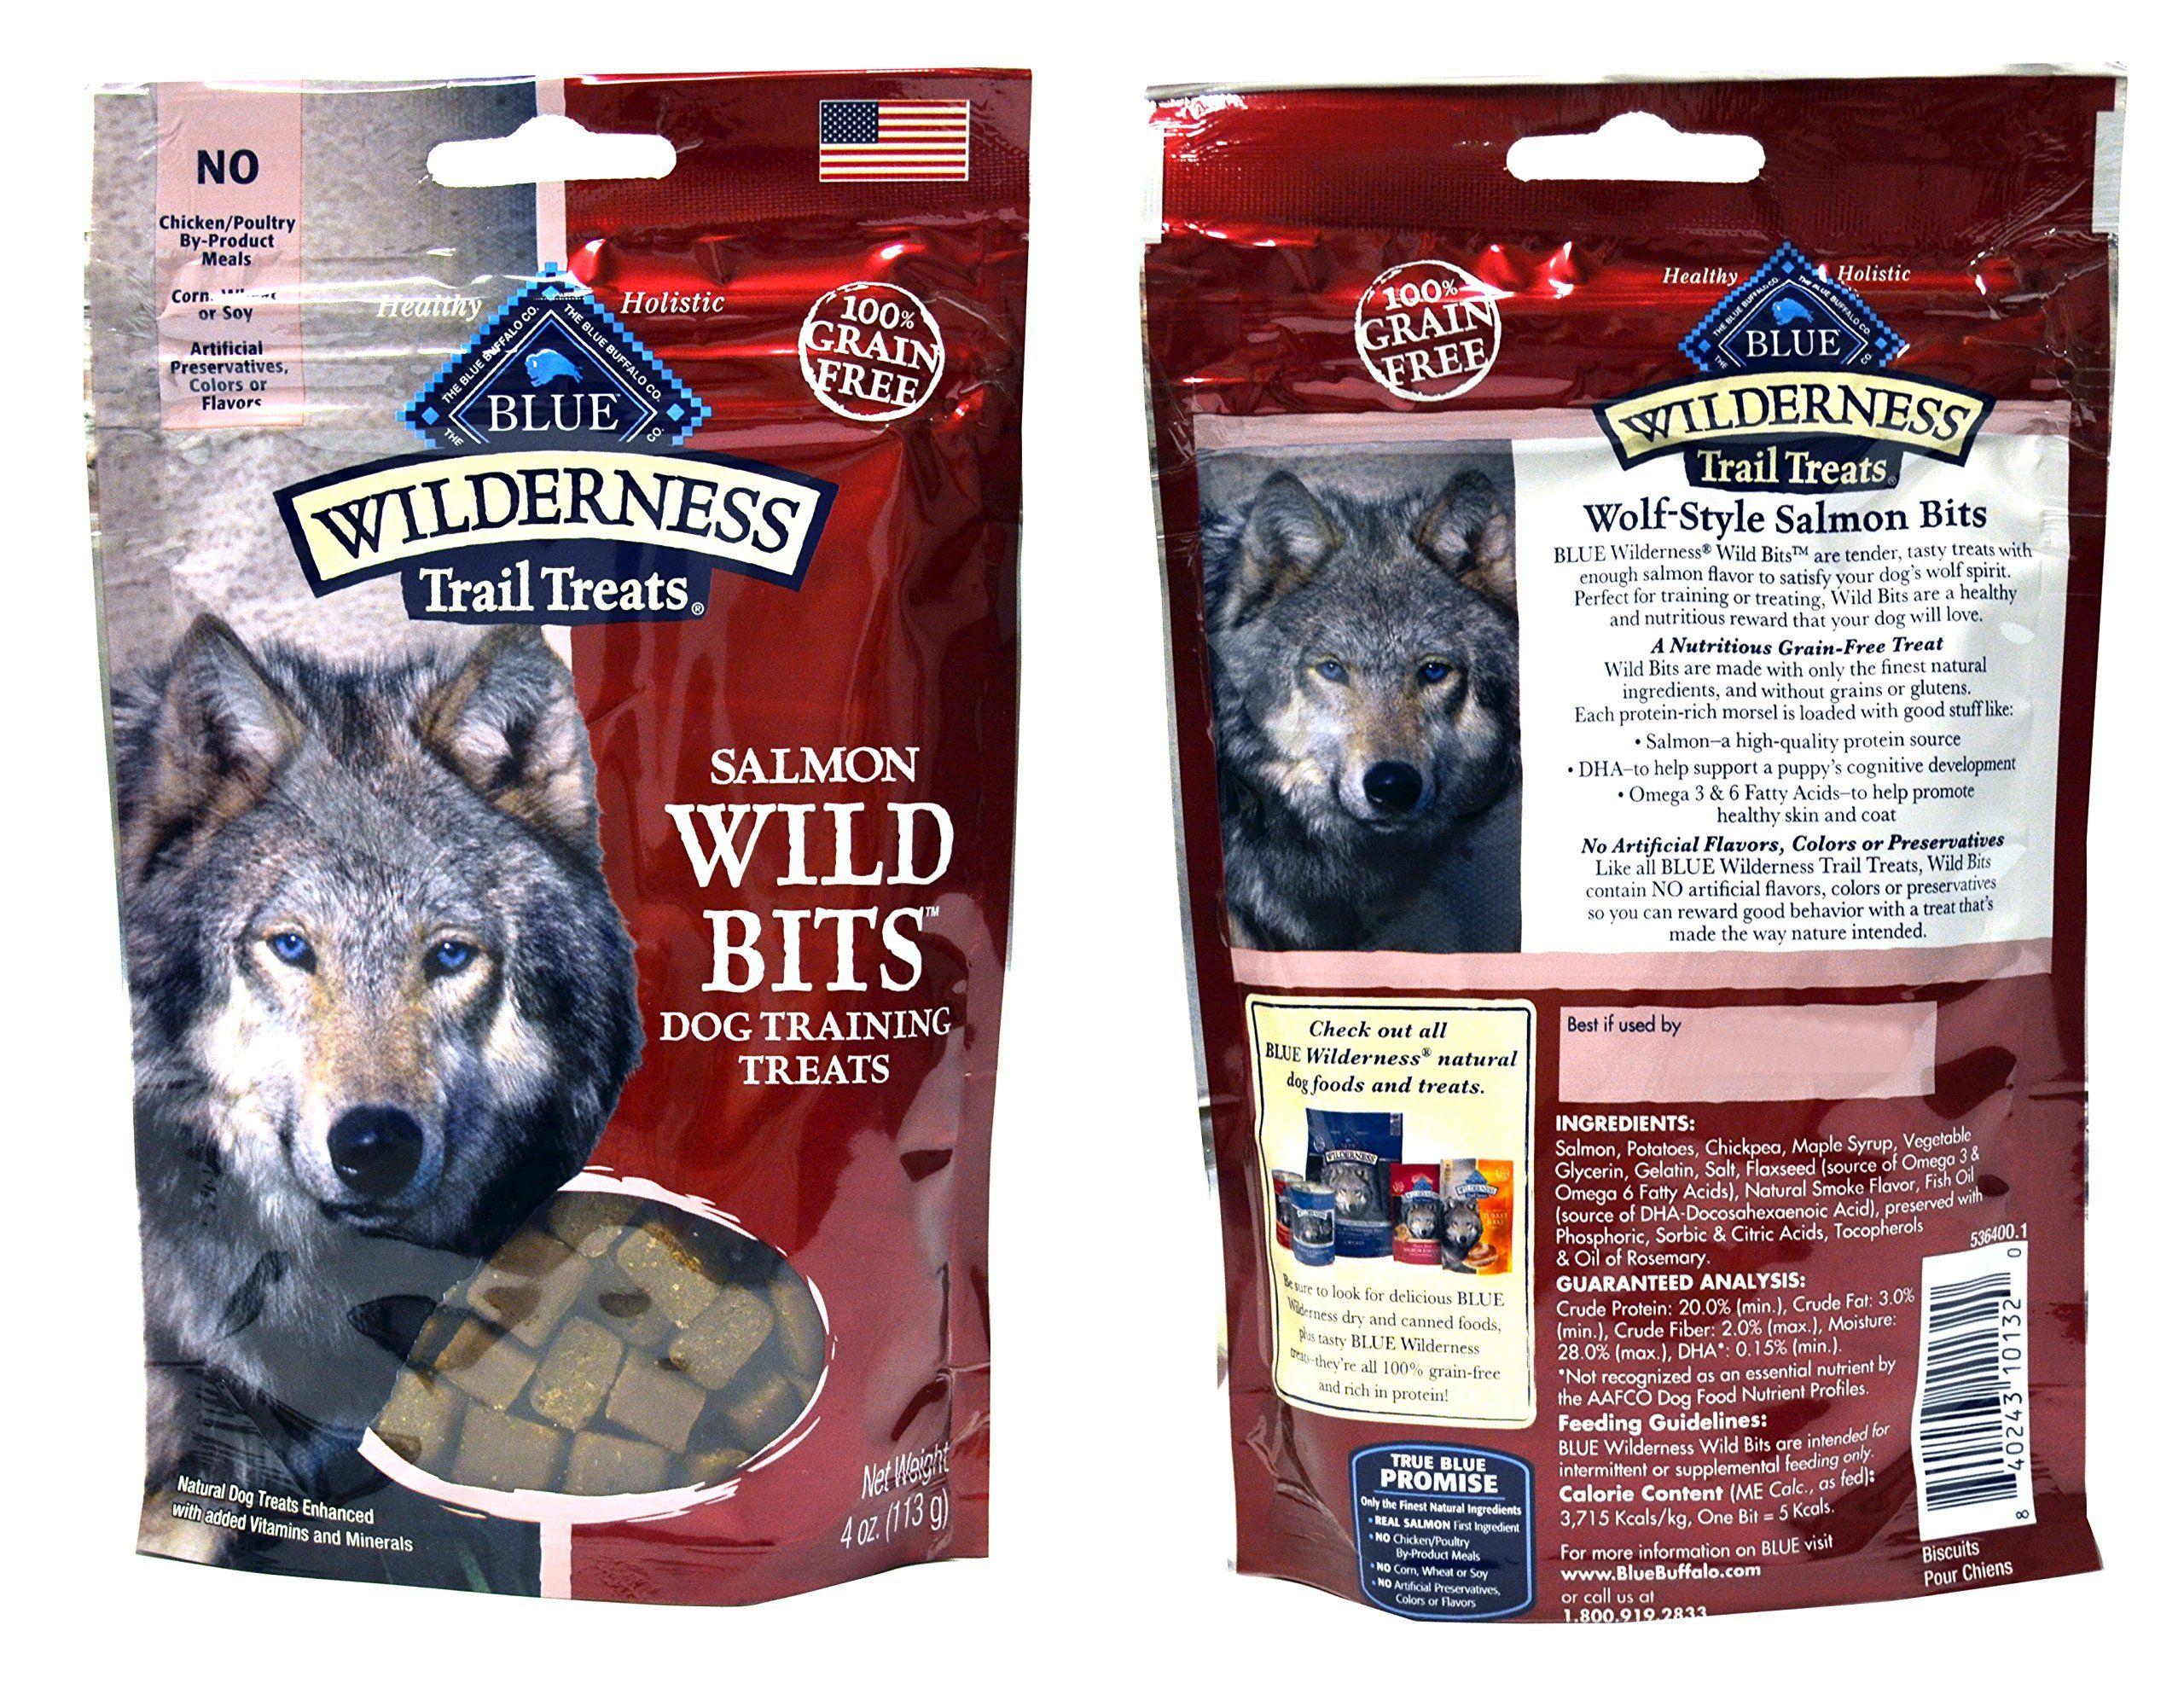 Blue Buffalo Wilderness Trail Treats Grainfree Wild Bits Dog